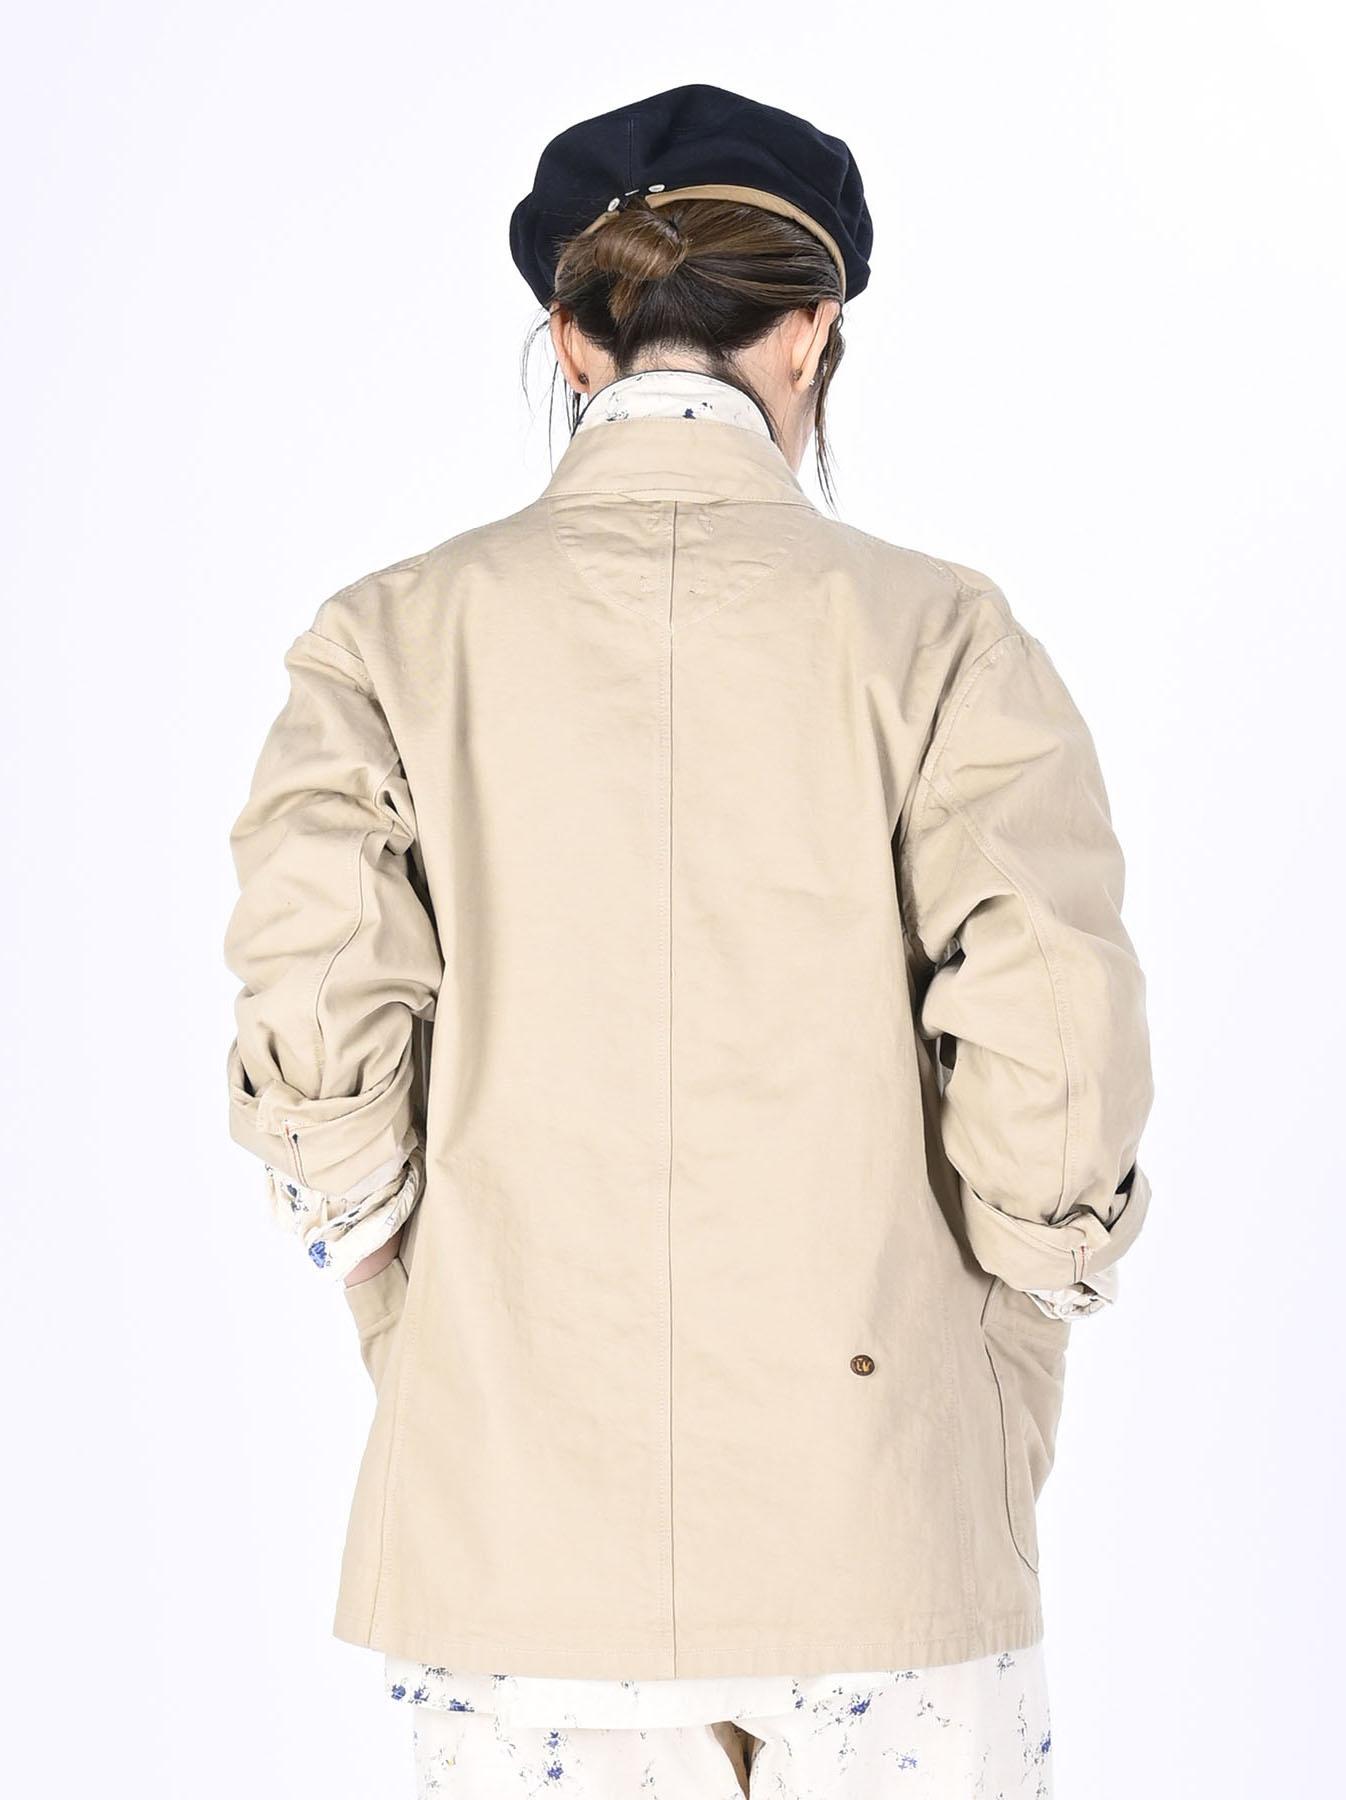 Okome Chino 908 Shirt Jacket-6